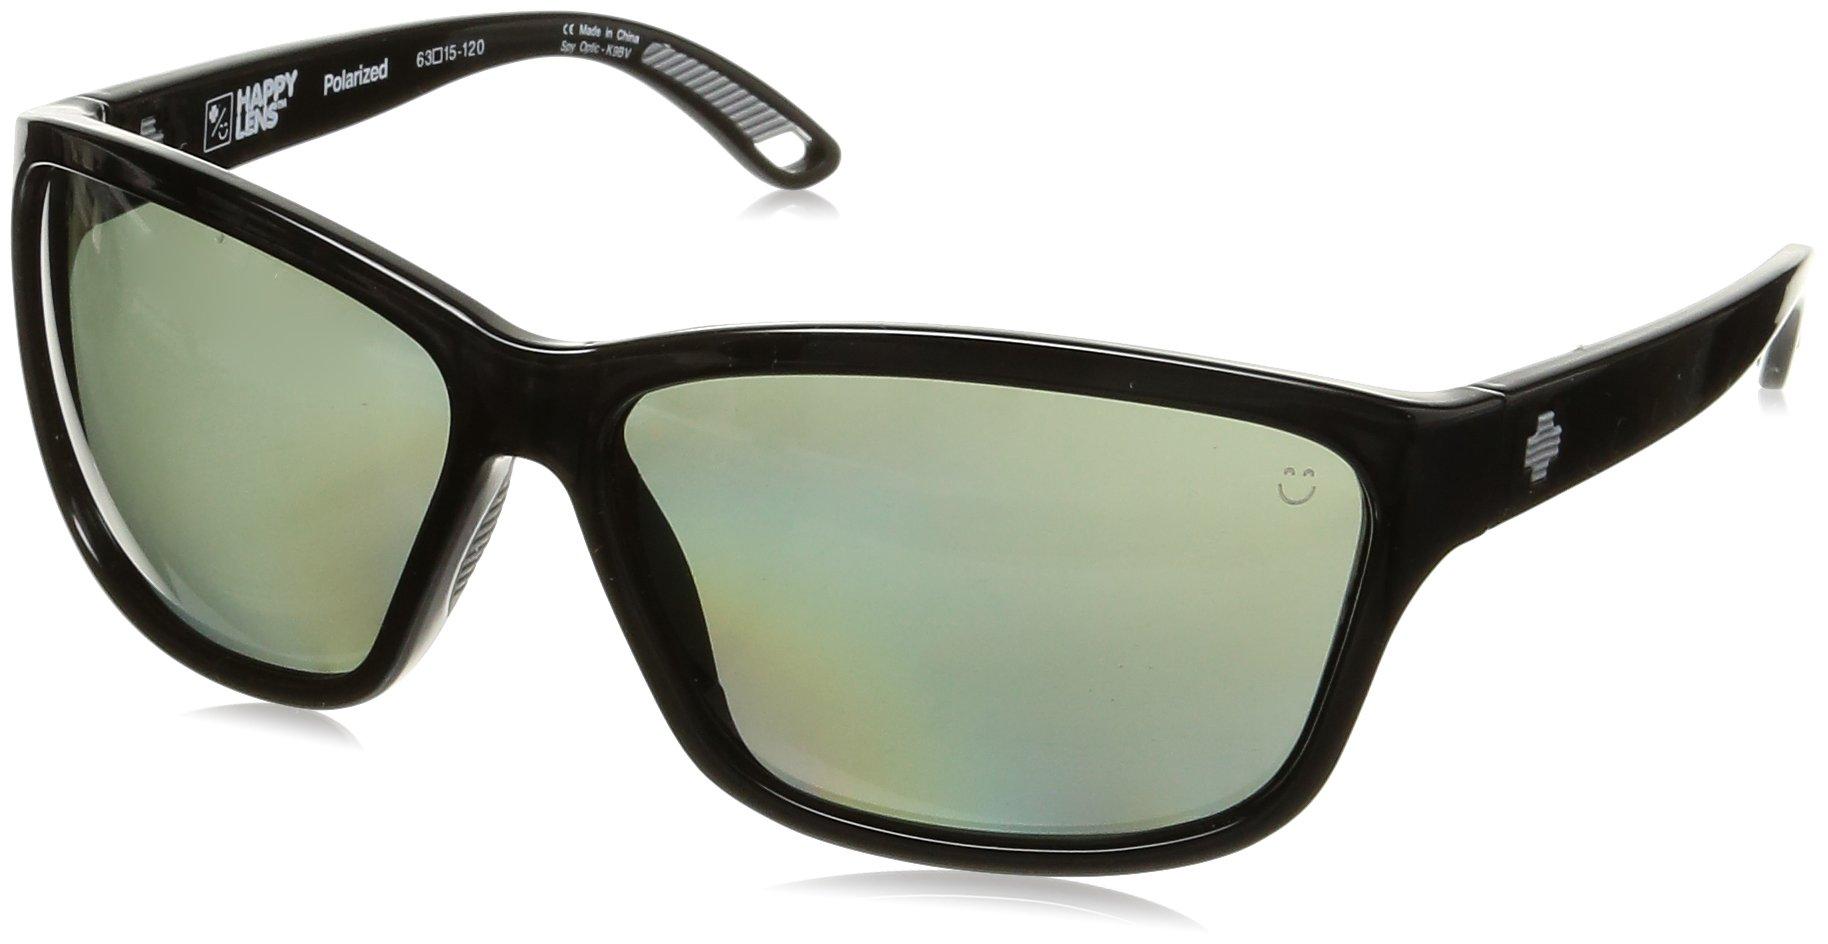 Spy Optic Allure Wrap Sunglasses, Black/Happy Gray/Green Polar, 63 mm